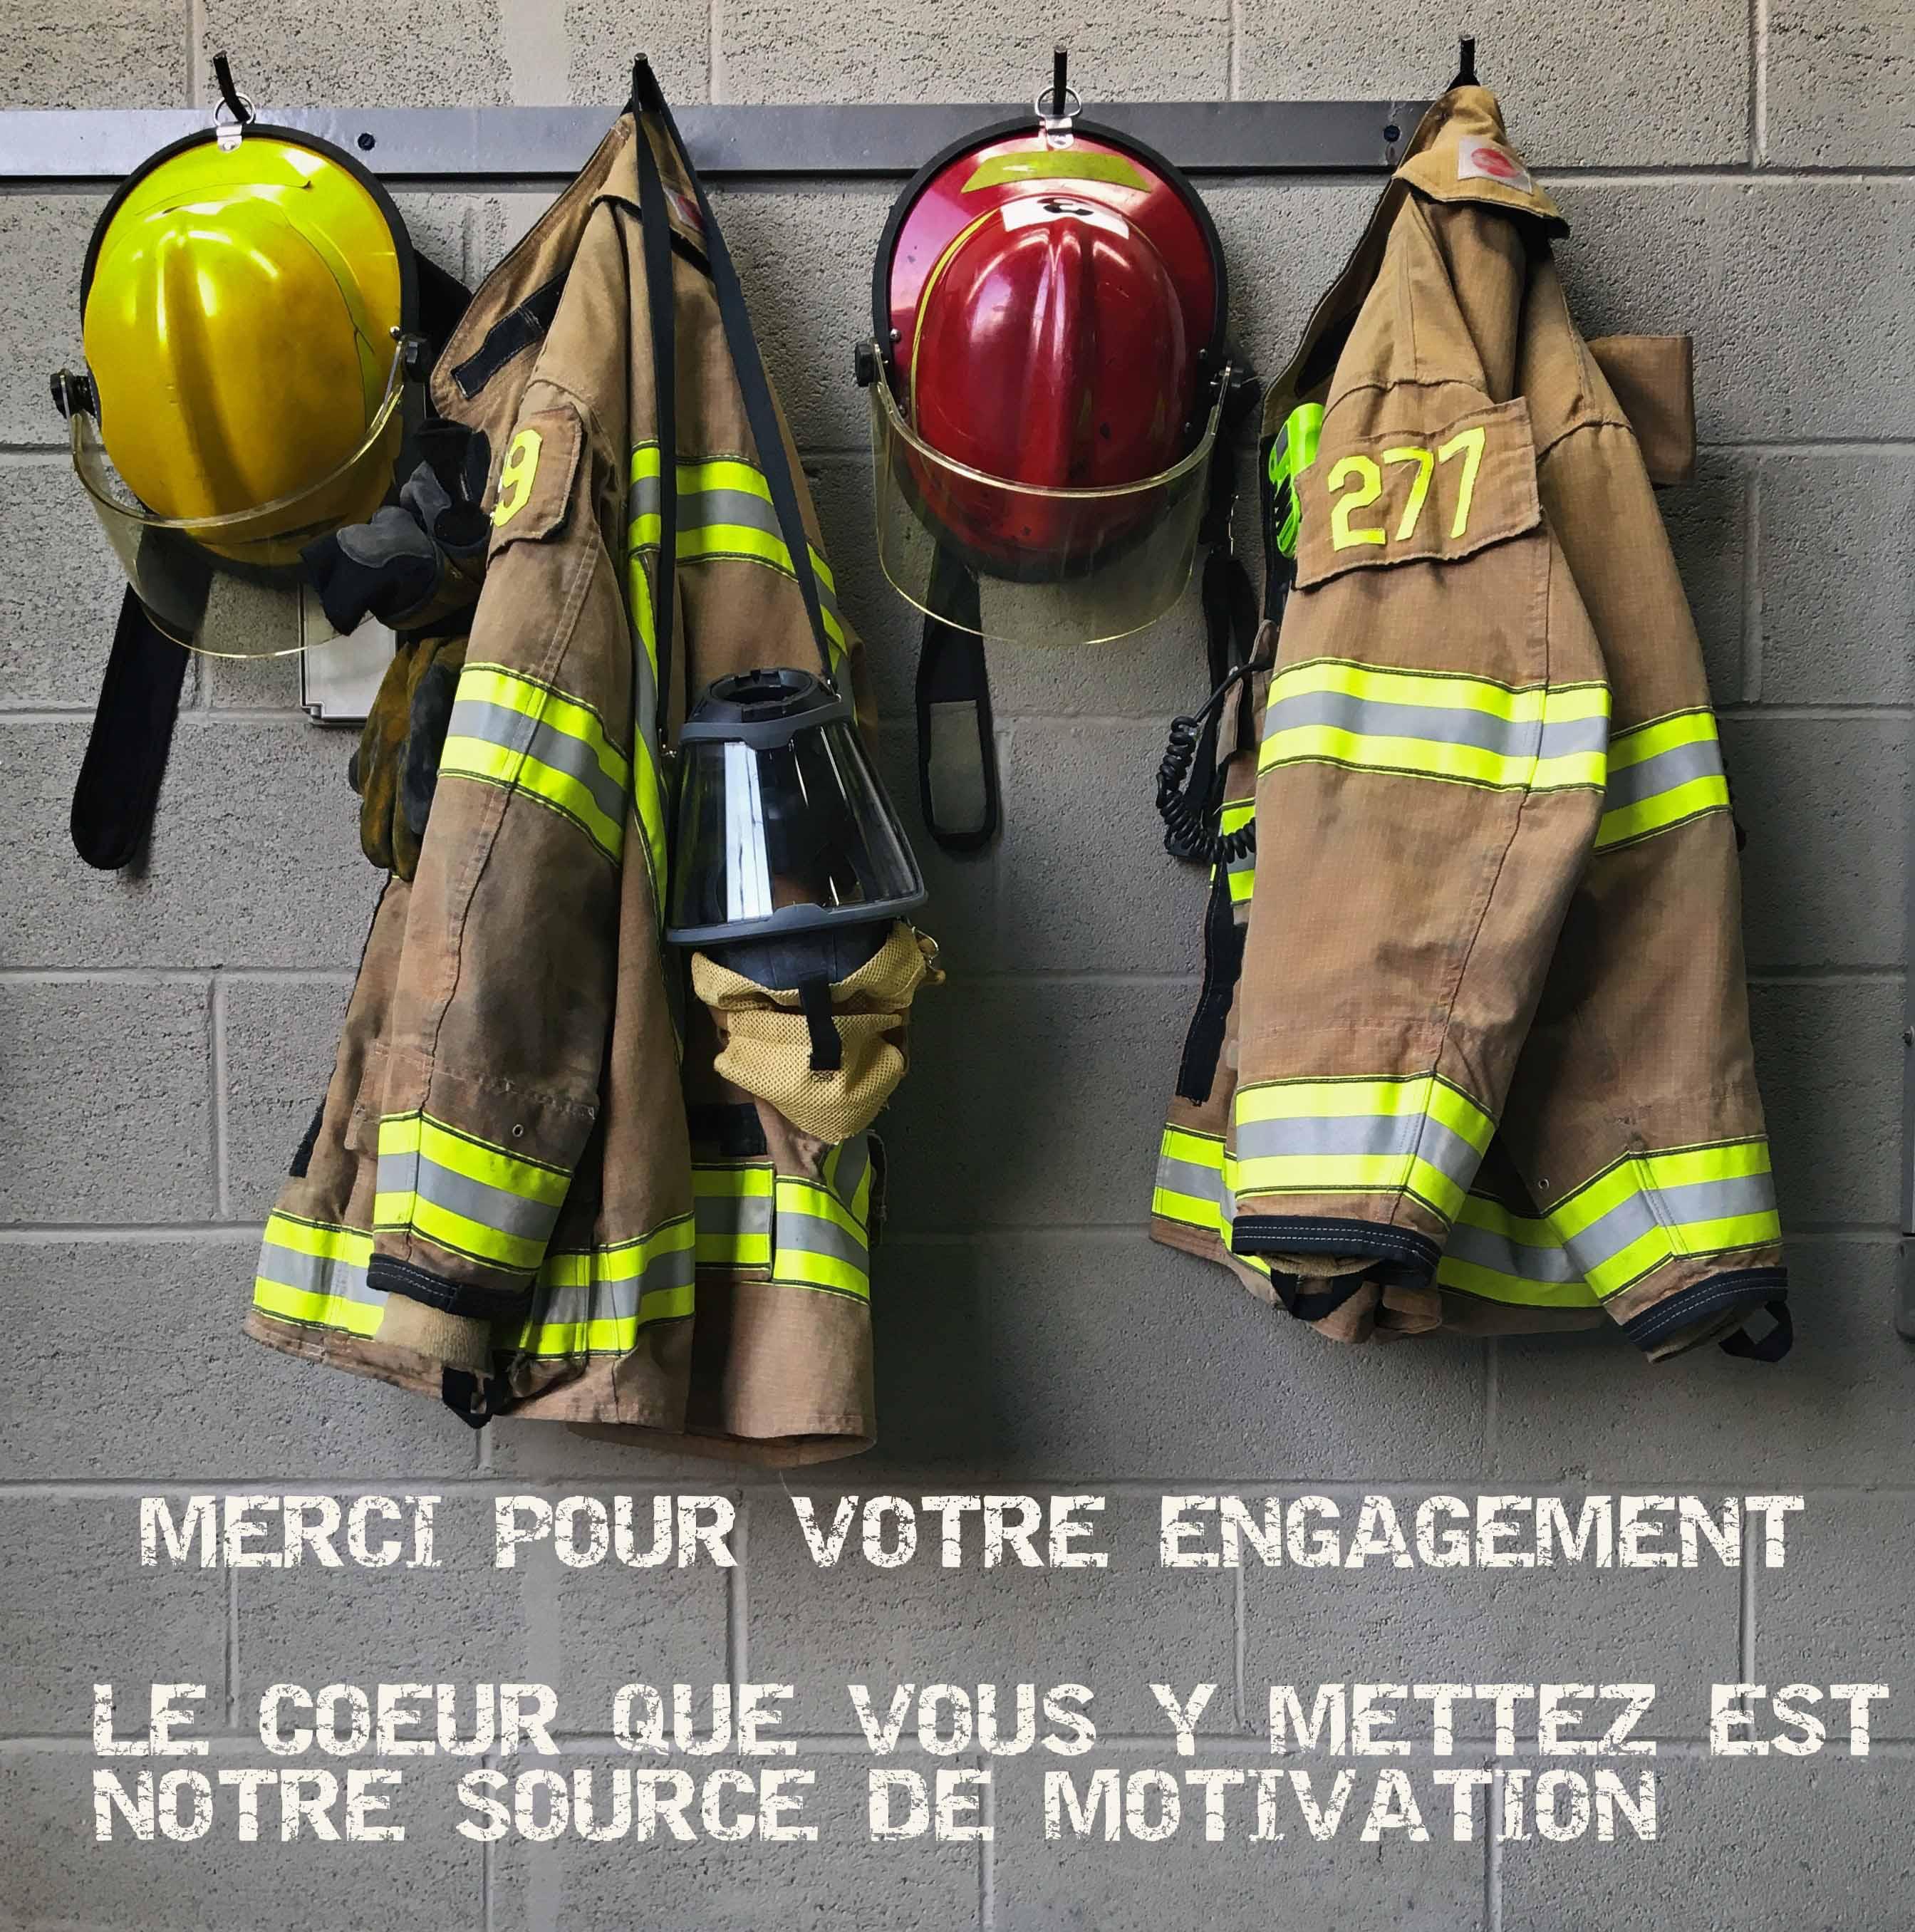 Pompier image